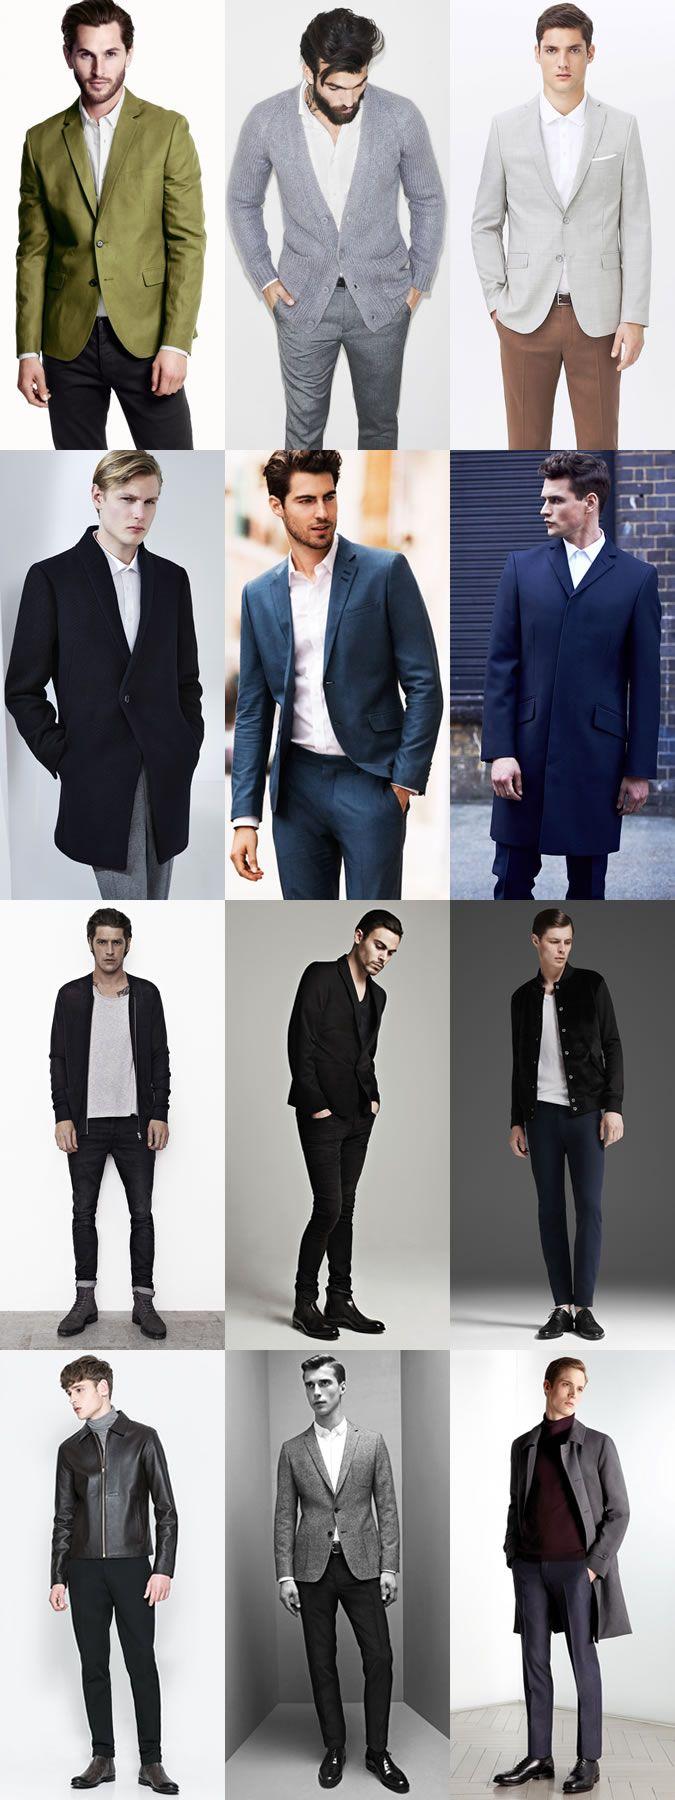 Men's Fashion Basics – Part 77 – White Jeans images